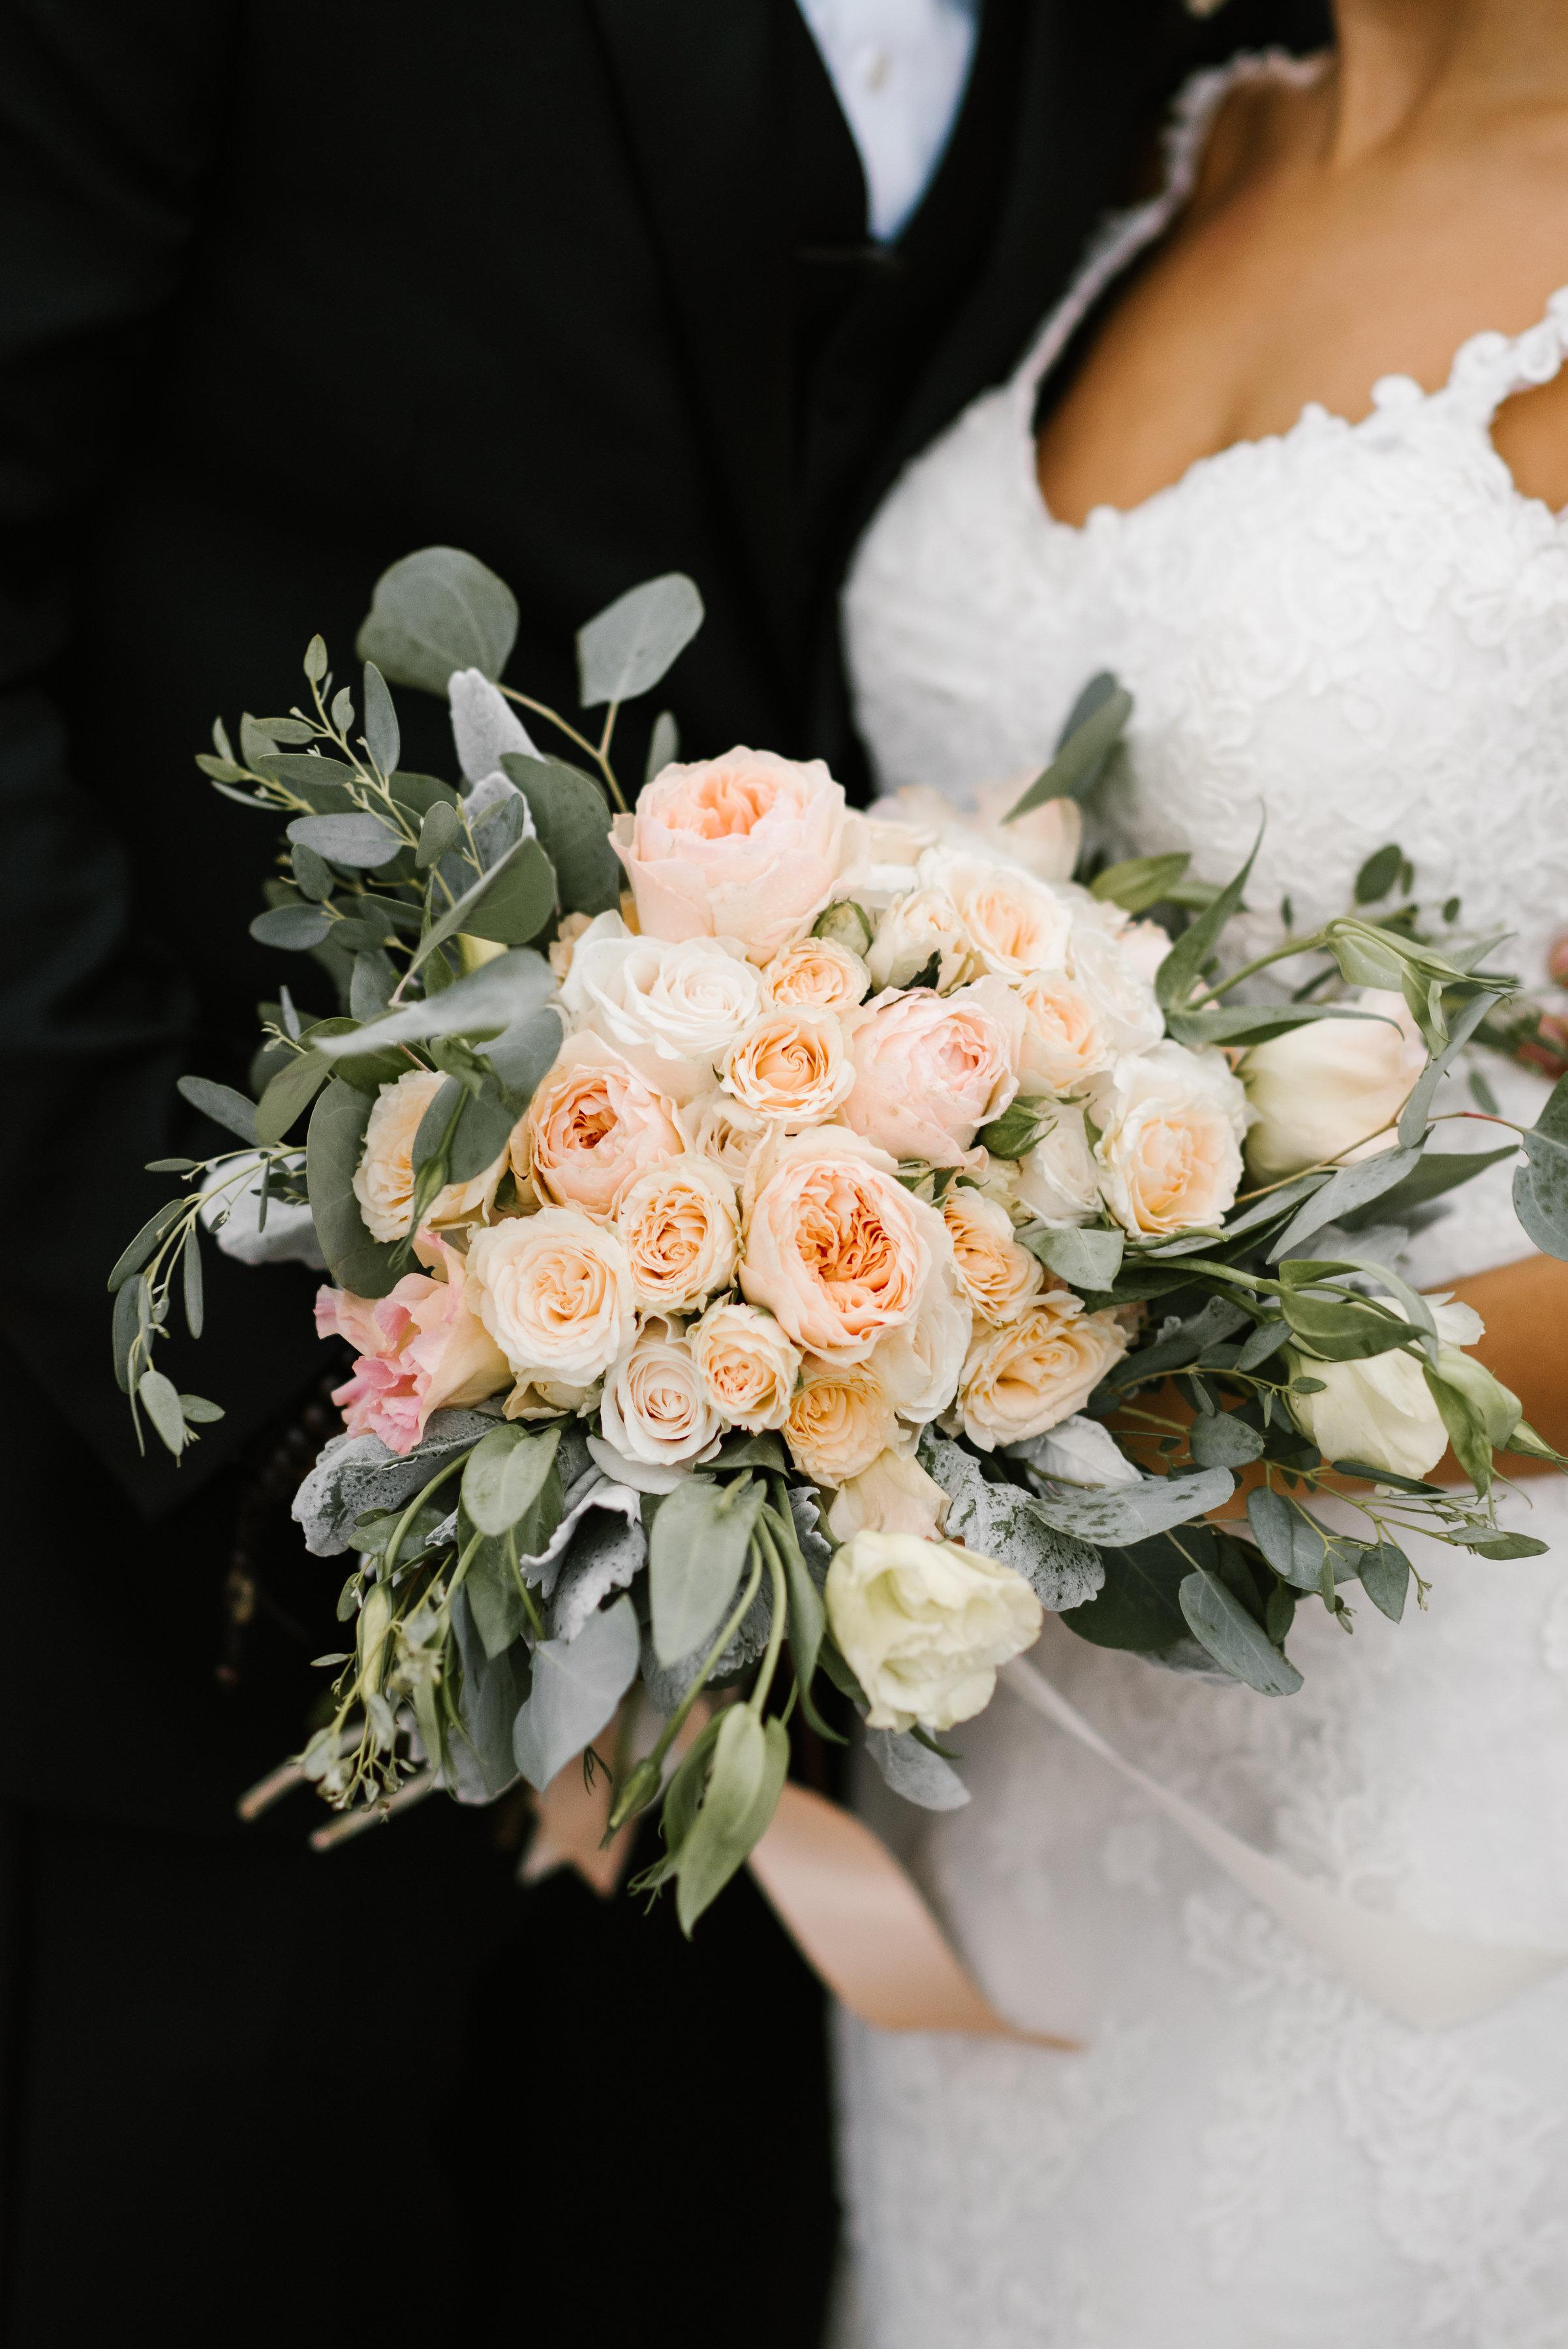 Rachel-Michael-Diaz-Wedding-822.jpg